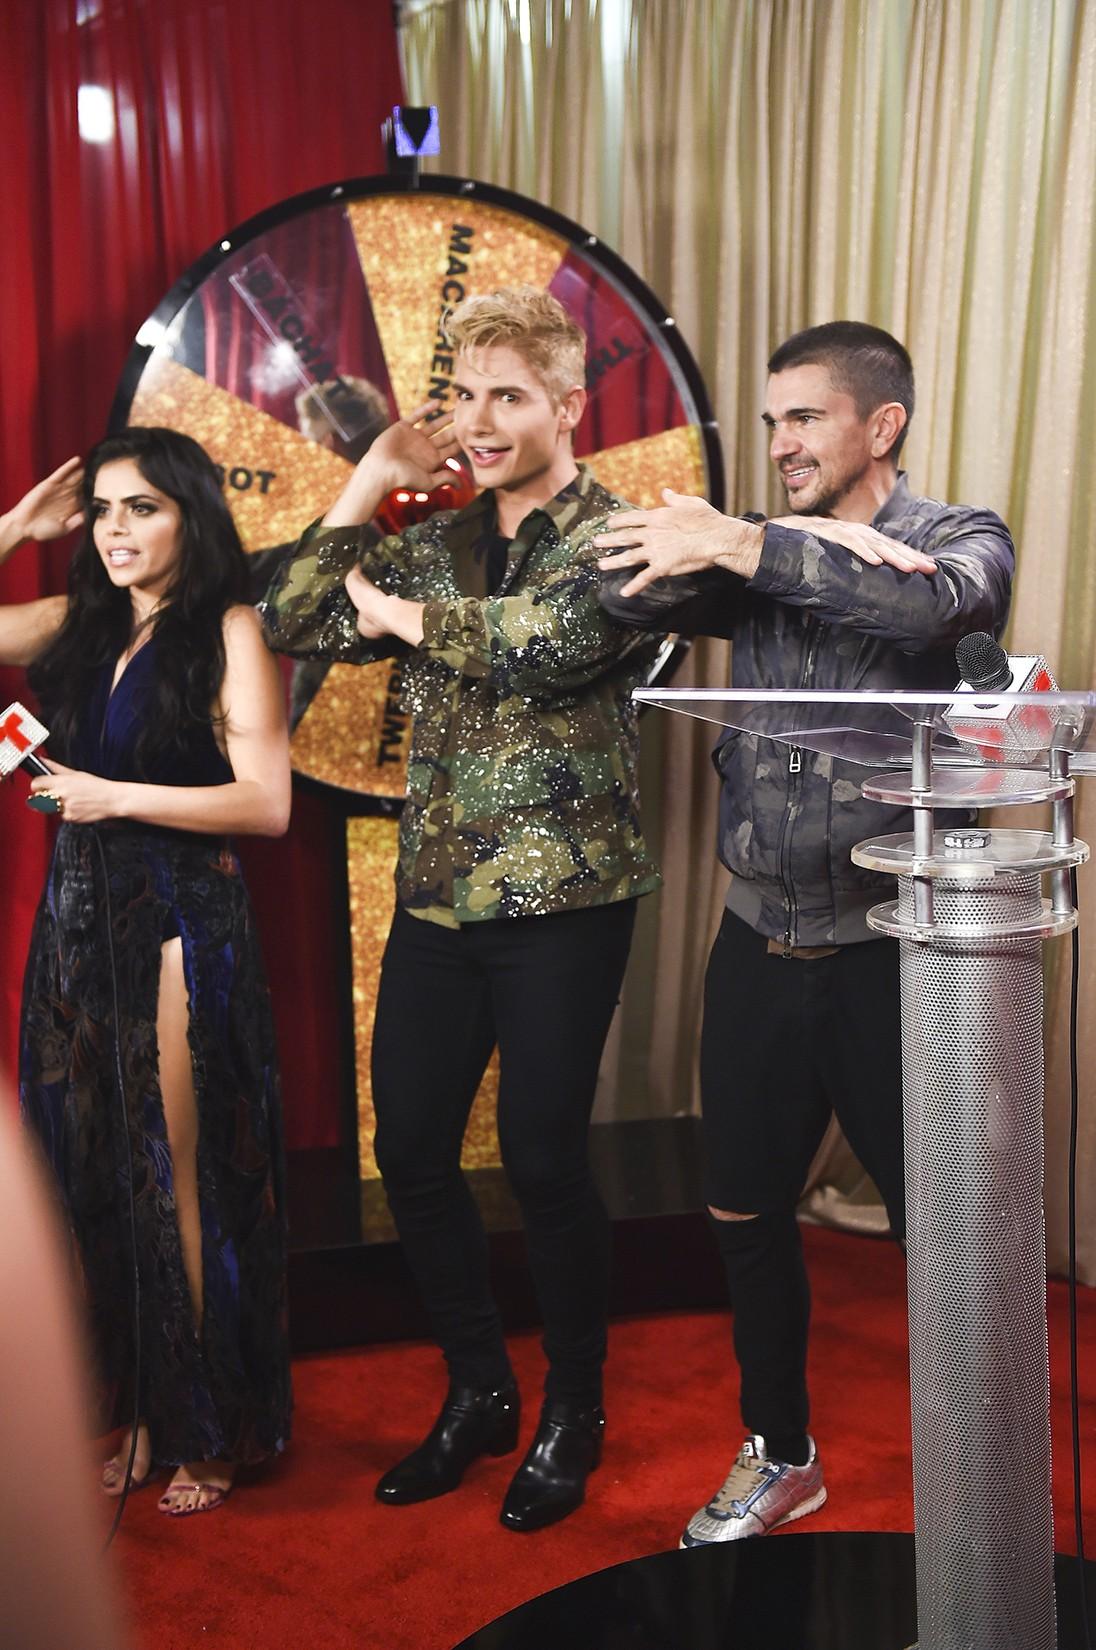 Juanes dances with Telemundo hosts